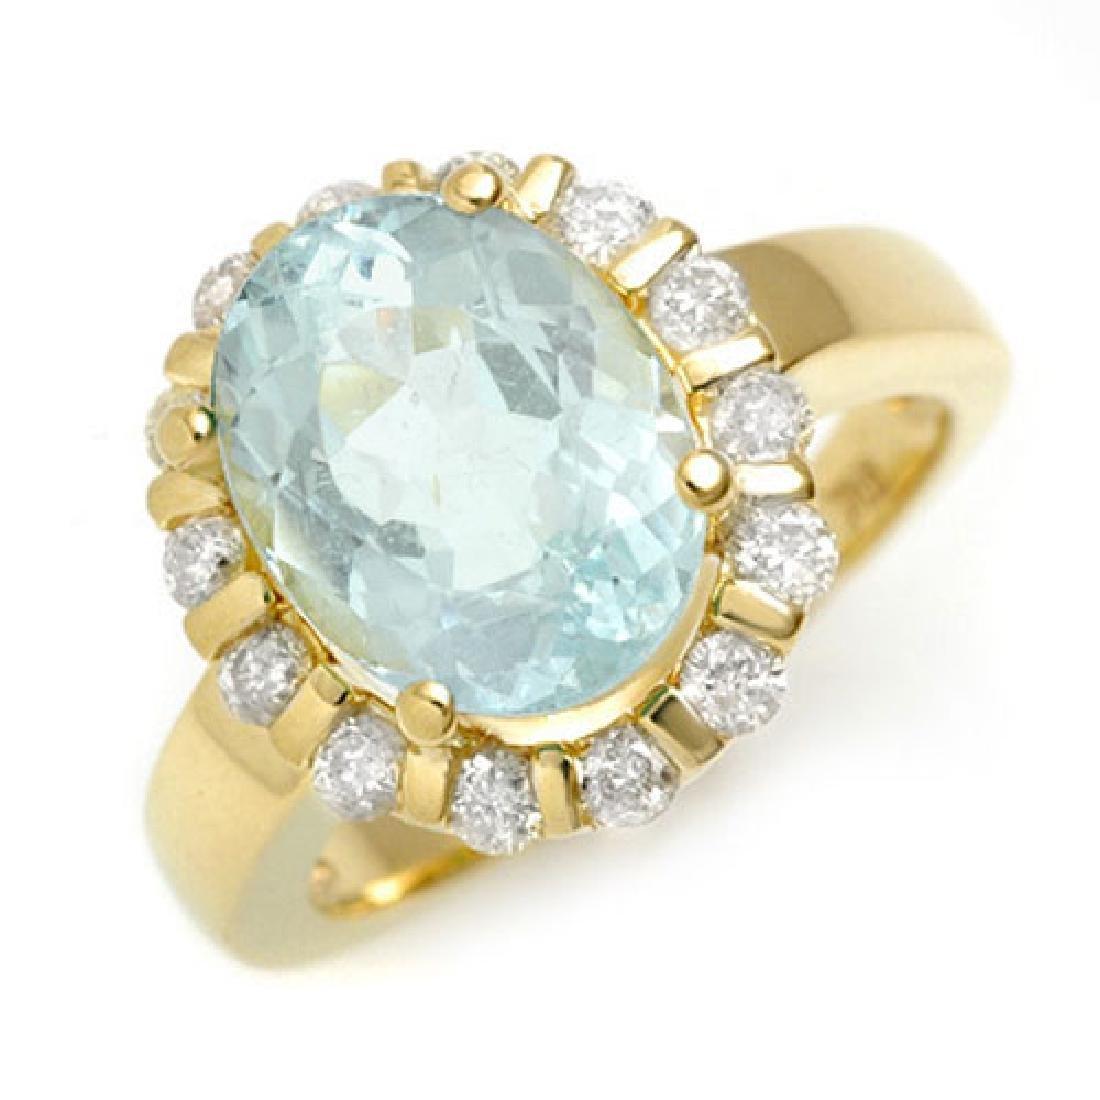 4.65 CTW Aquamarine & Diamond Ring 10K Yellow Gold